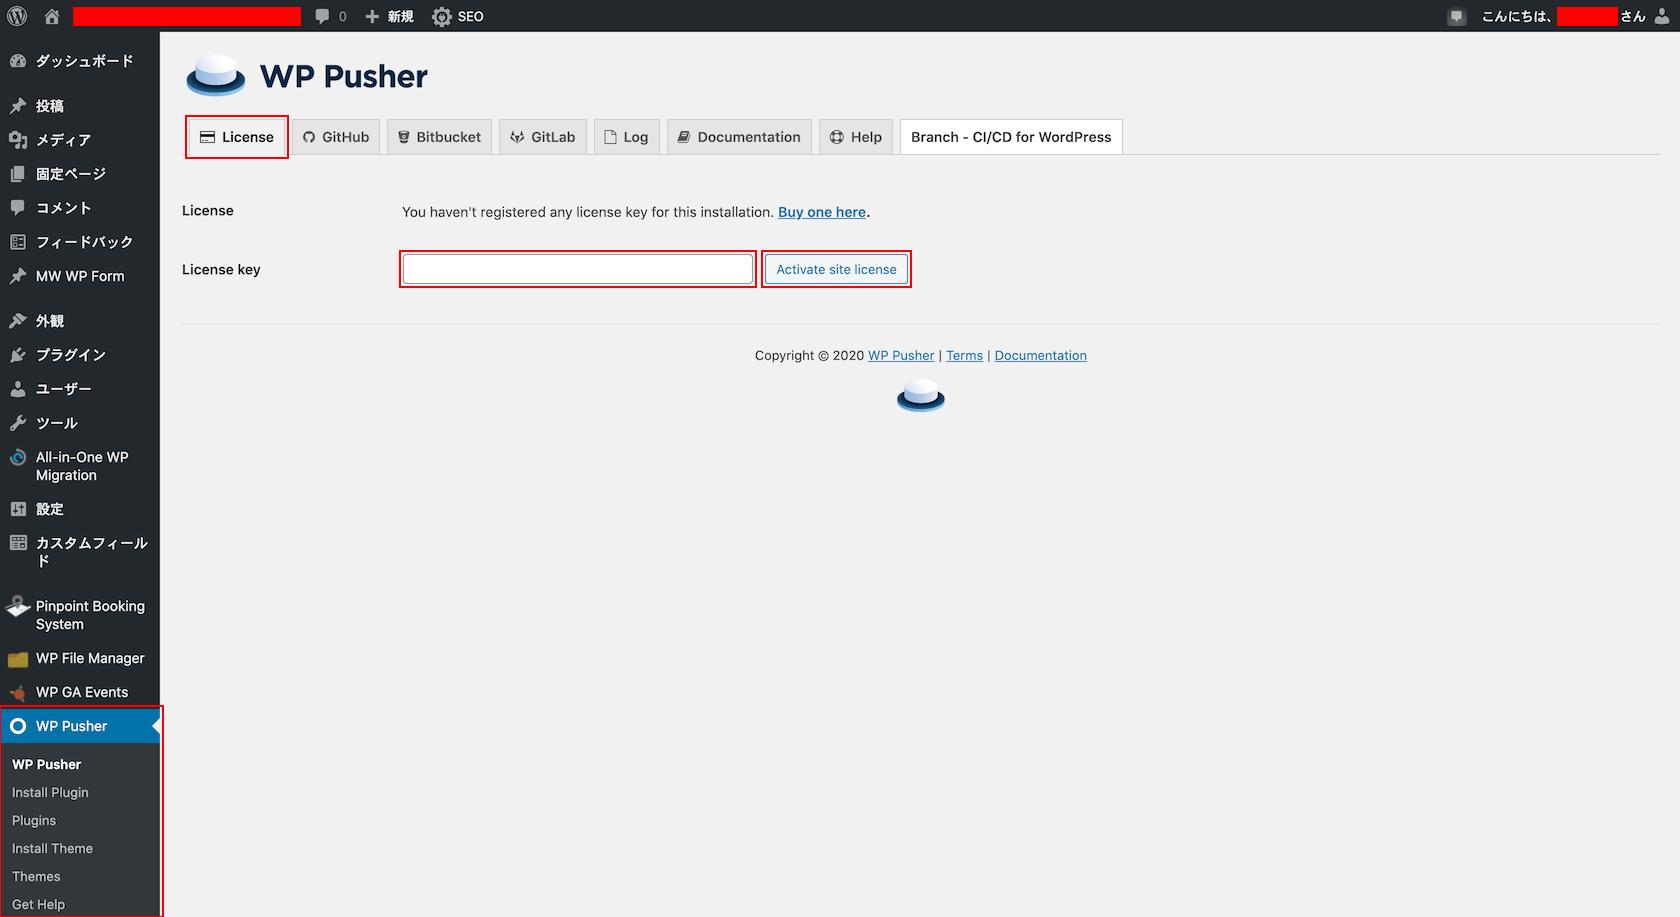 FireShot Capture 303 - WP Pusher ‹ 【Shifter 検証用】現場クラウド Conne — WordPress - testgenbasupportcom.local.png